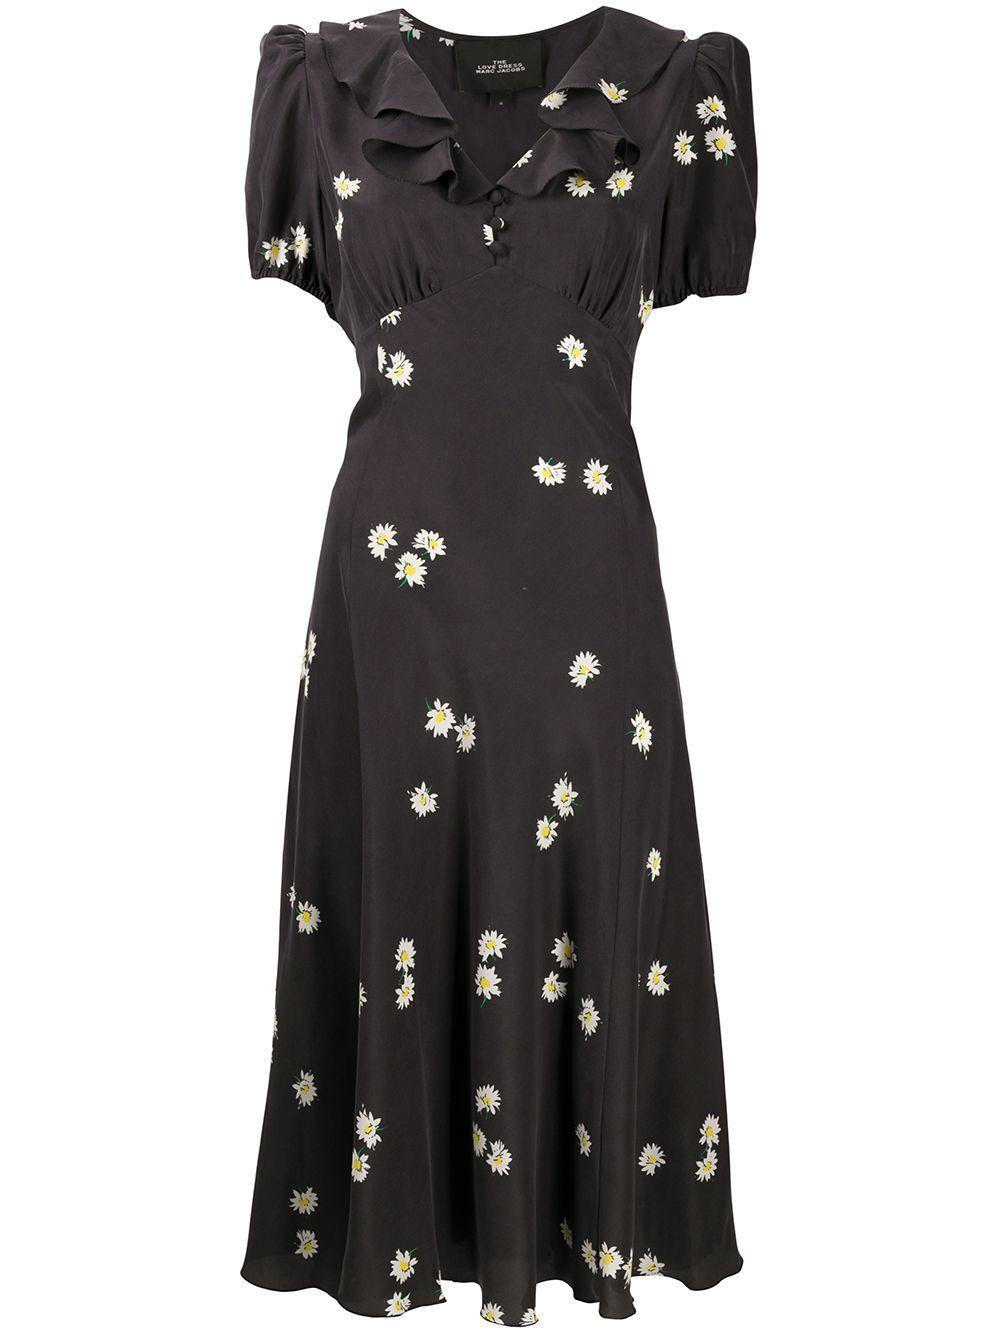 The Love dress